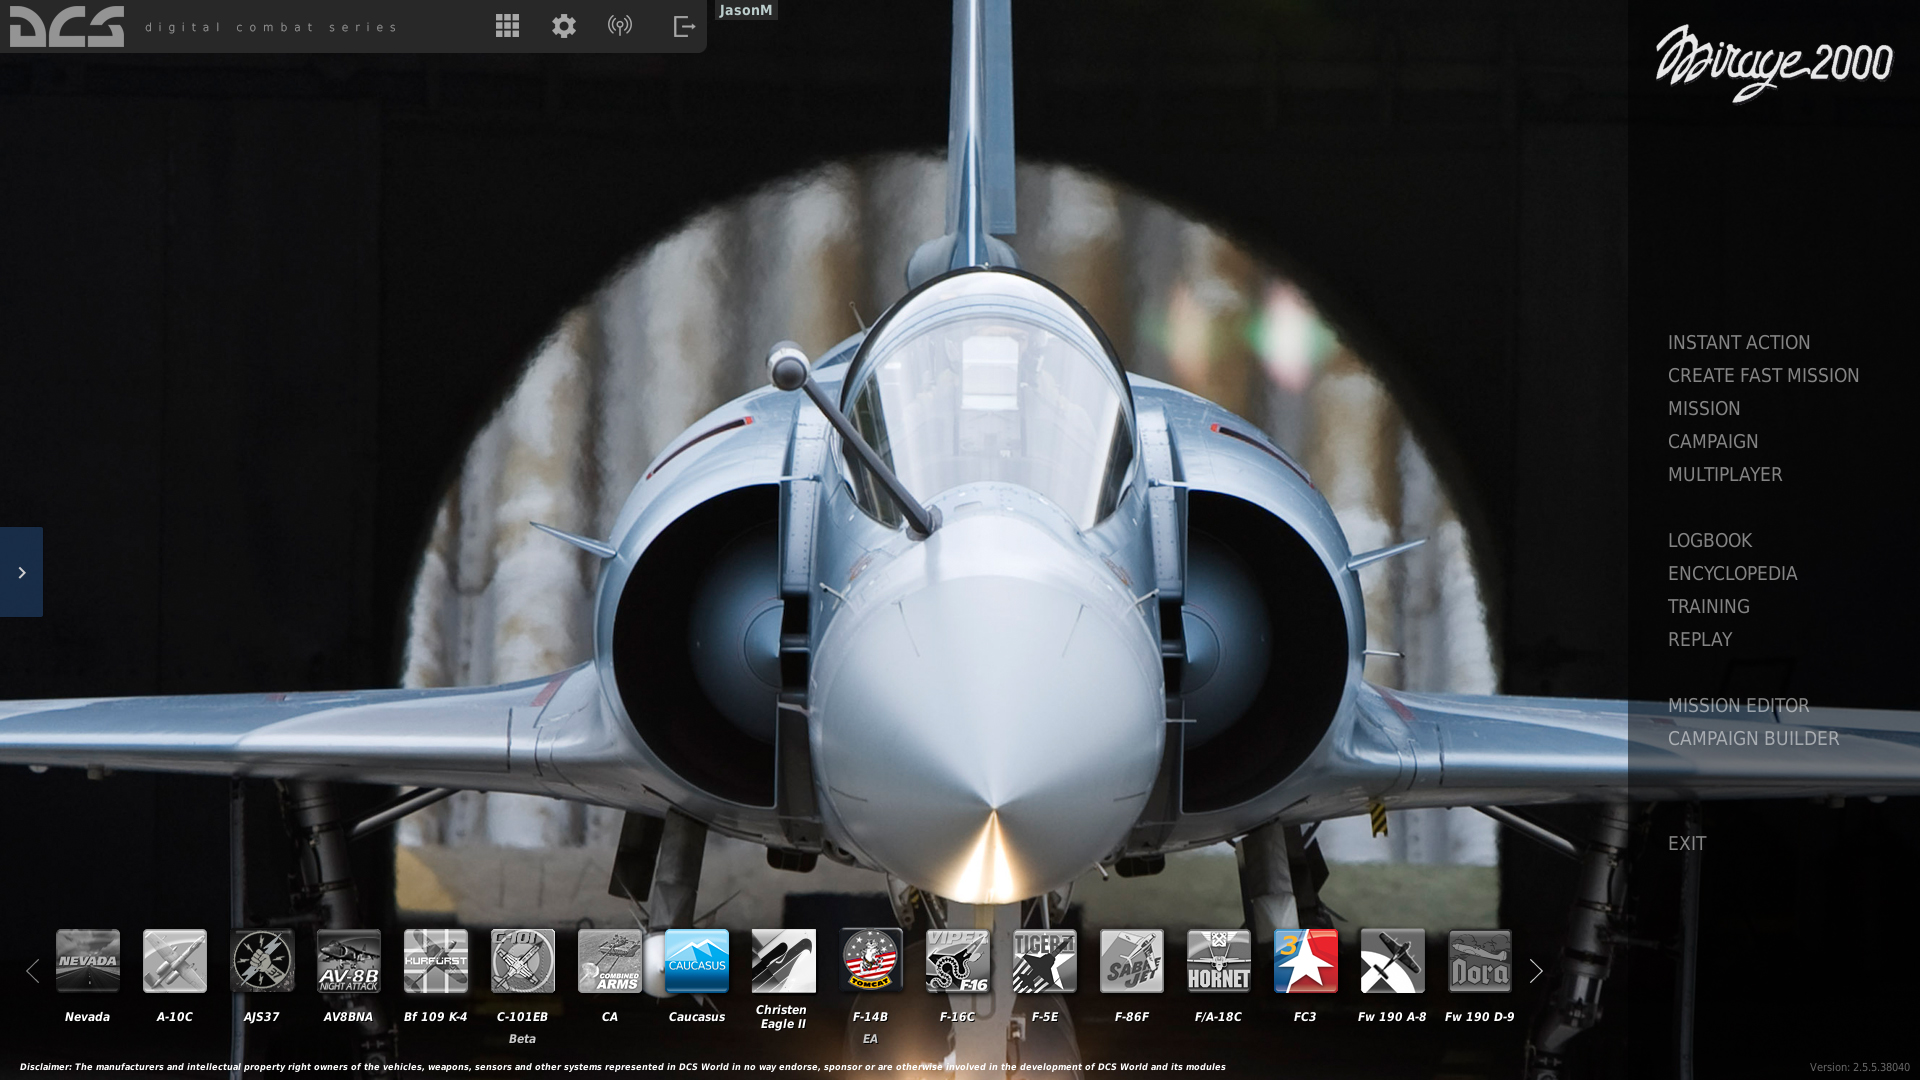 Hellenic Air Force Mirage 2000 Menu